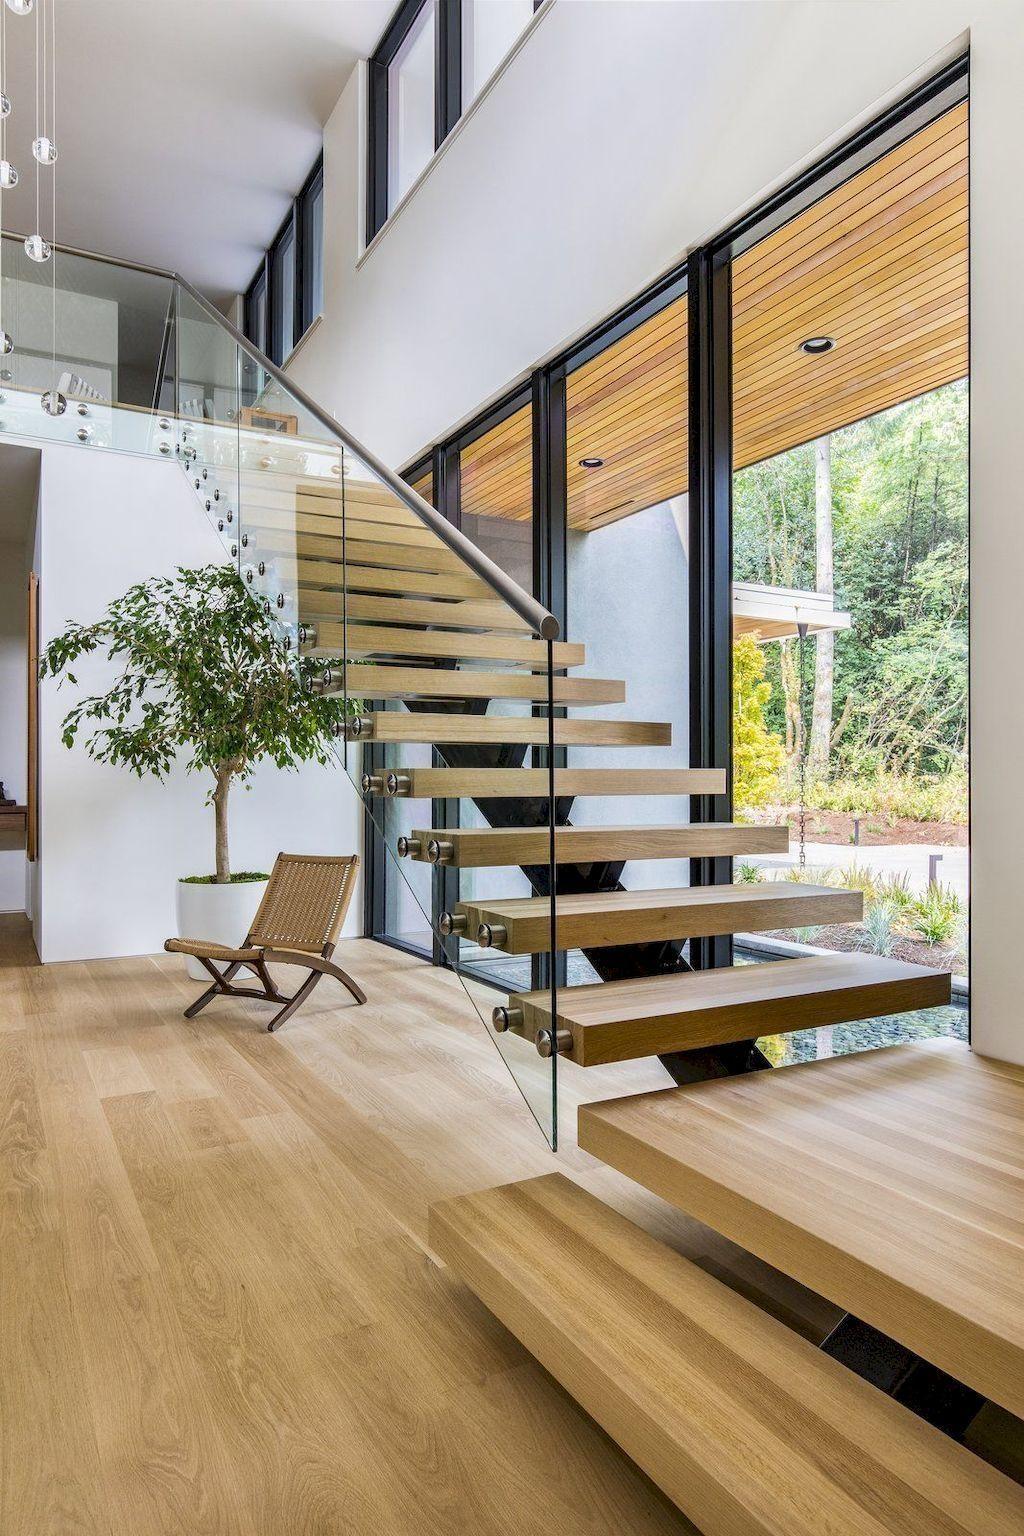 30 Best Minimalist Staircase Design Ideas You Must Have Staircase Design Modern Staircase Staircase Decor